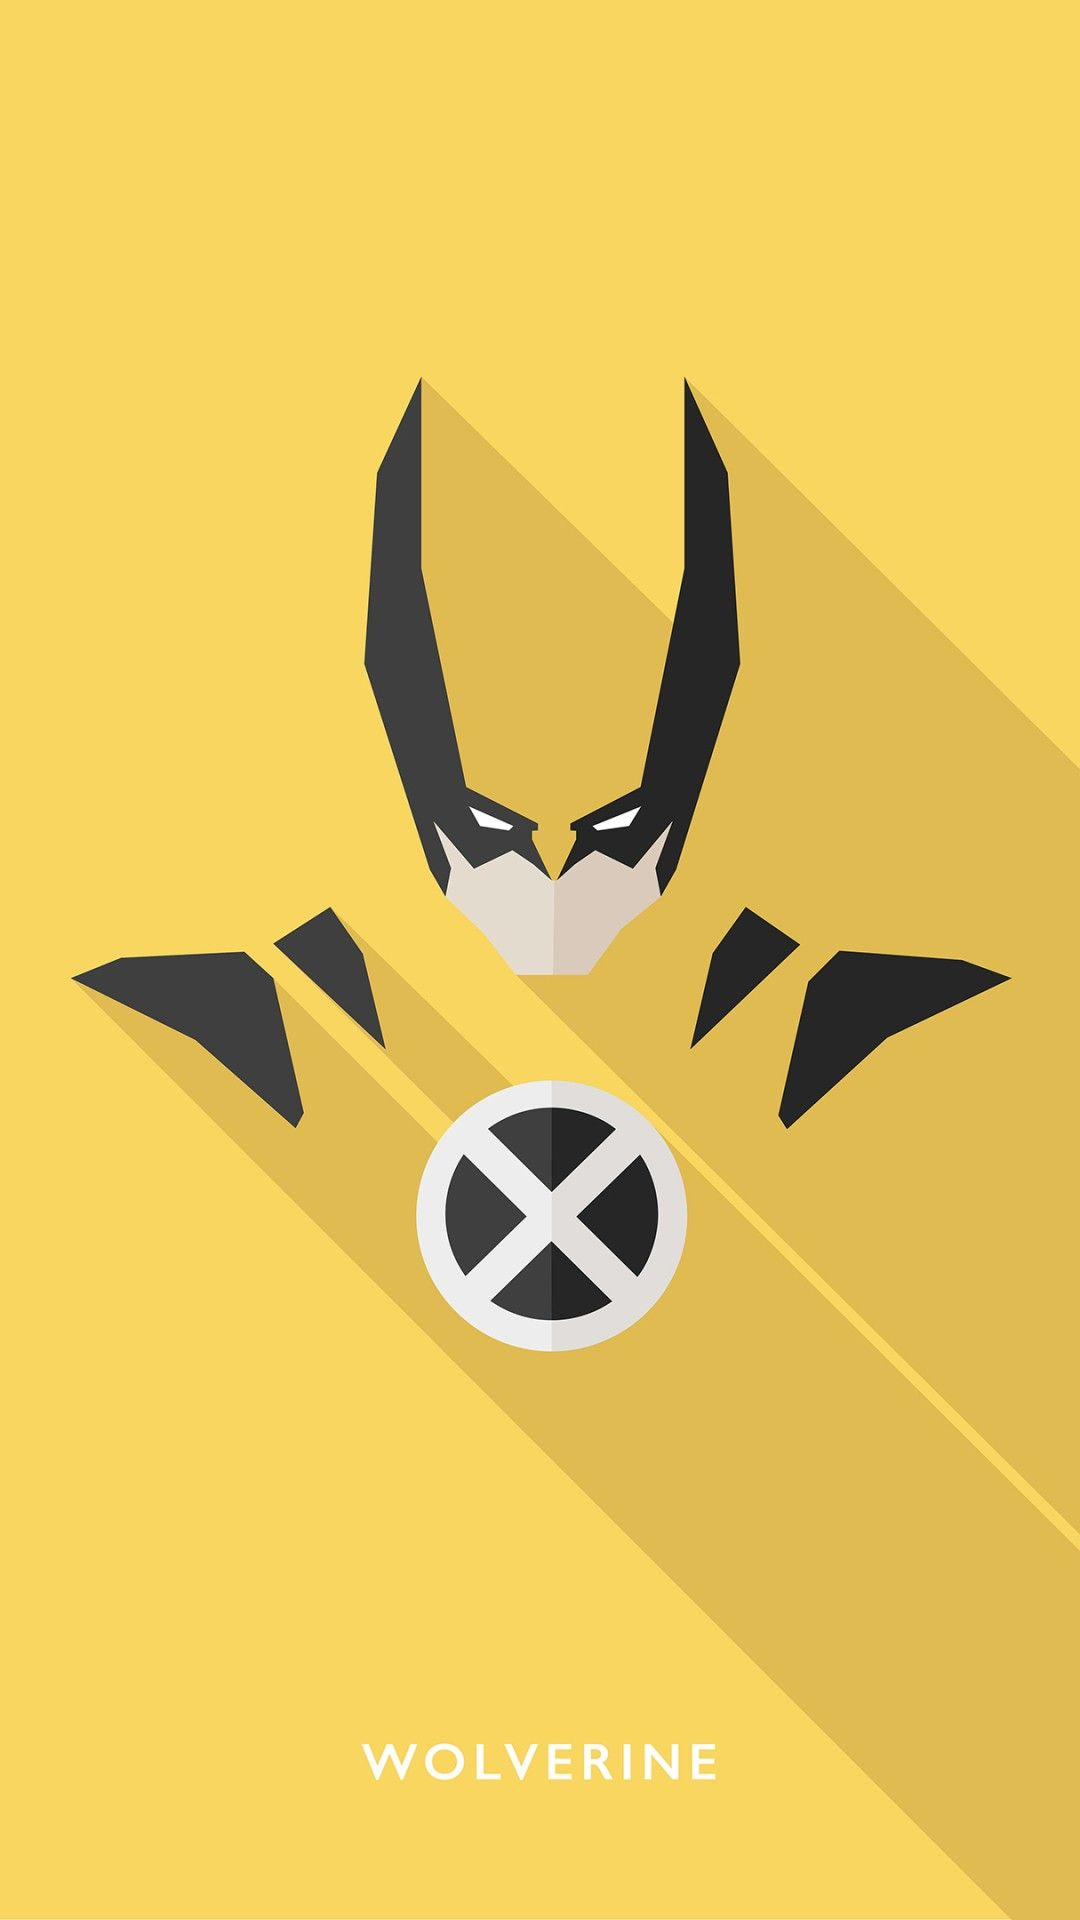 Wallpaper Phone Wolverine Full Hd Marvel Wolverine The Wolverine Fondos De Pantalla Marvel